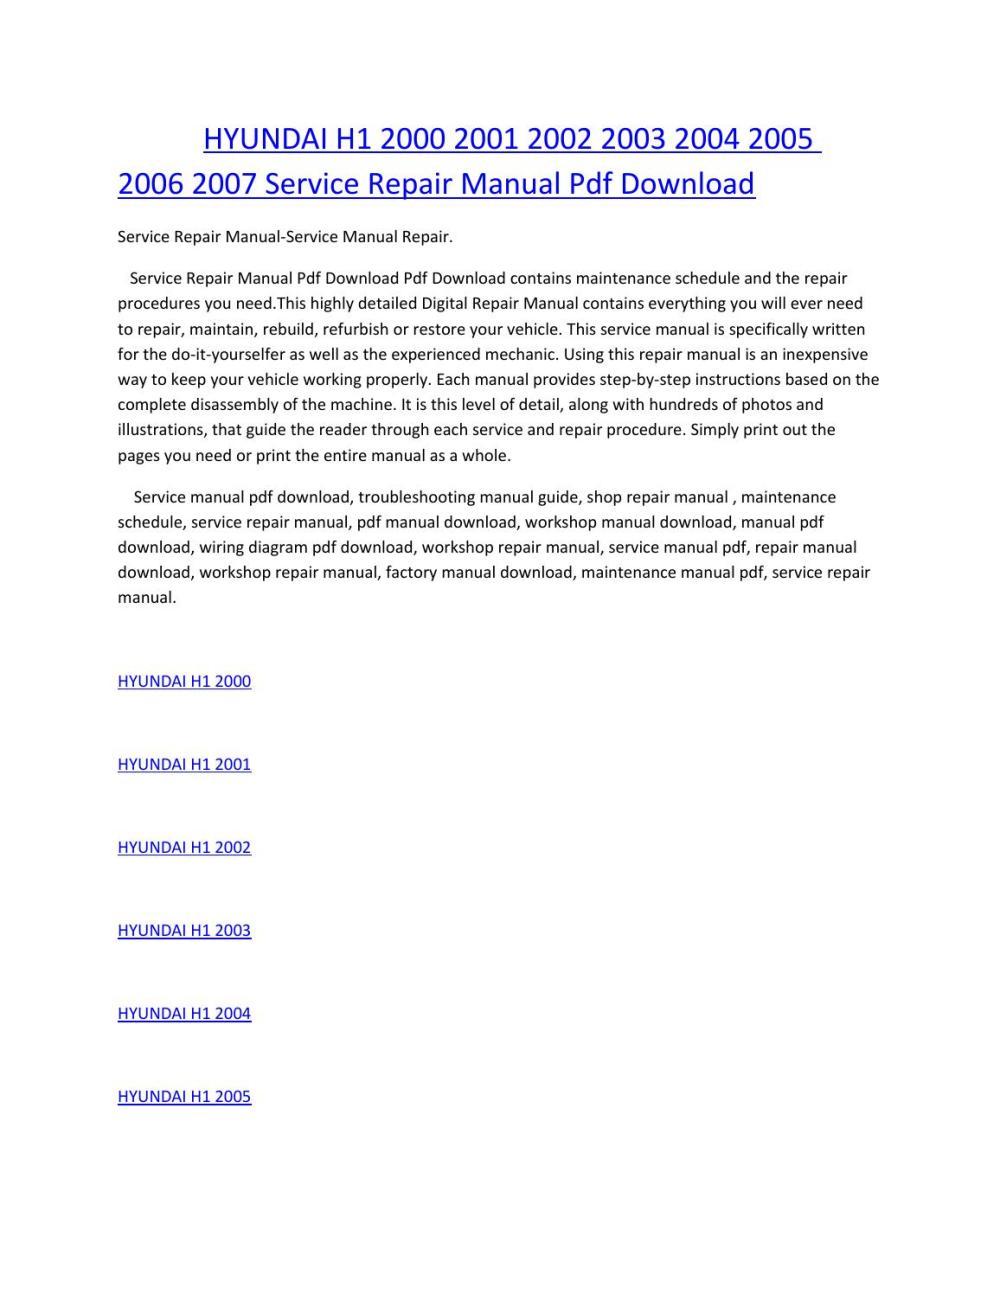 medium resolution of hyundai h1 wiring diagram wiring libraryhyundai h1 2000 2001 2002 2003 2004 2005 2006 2007 service